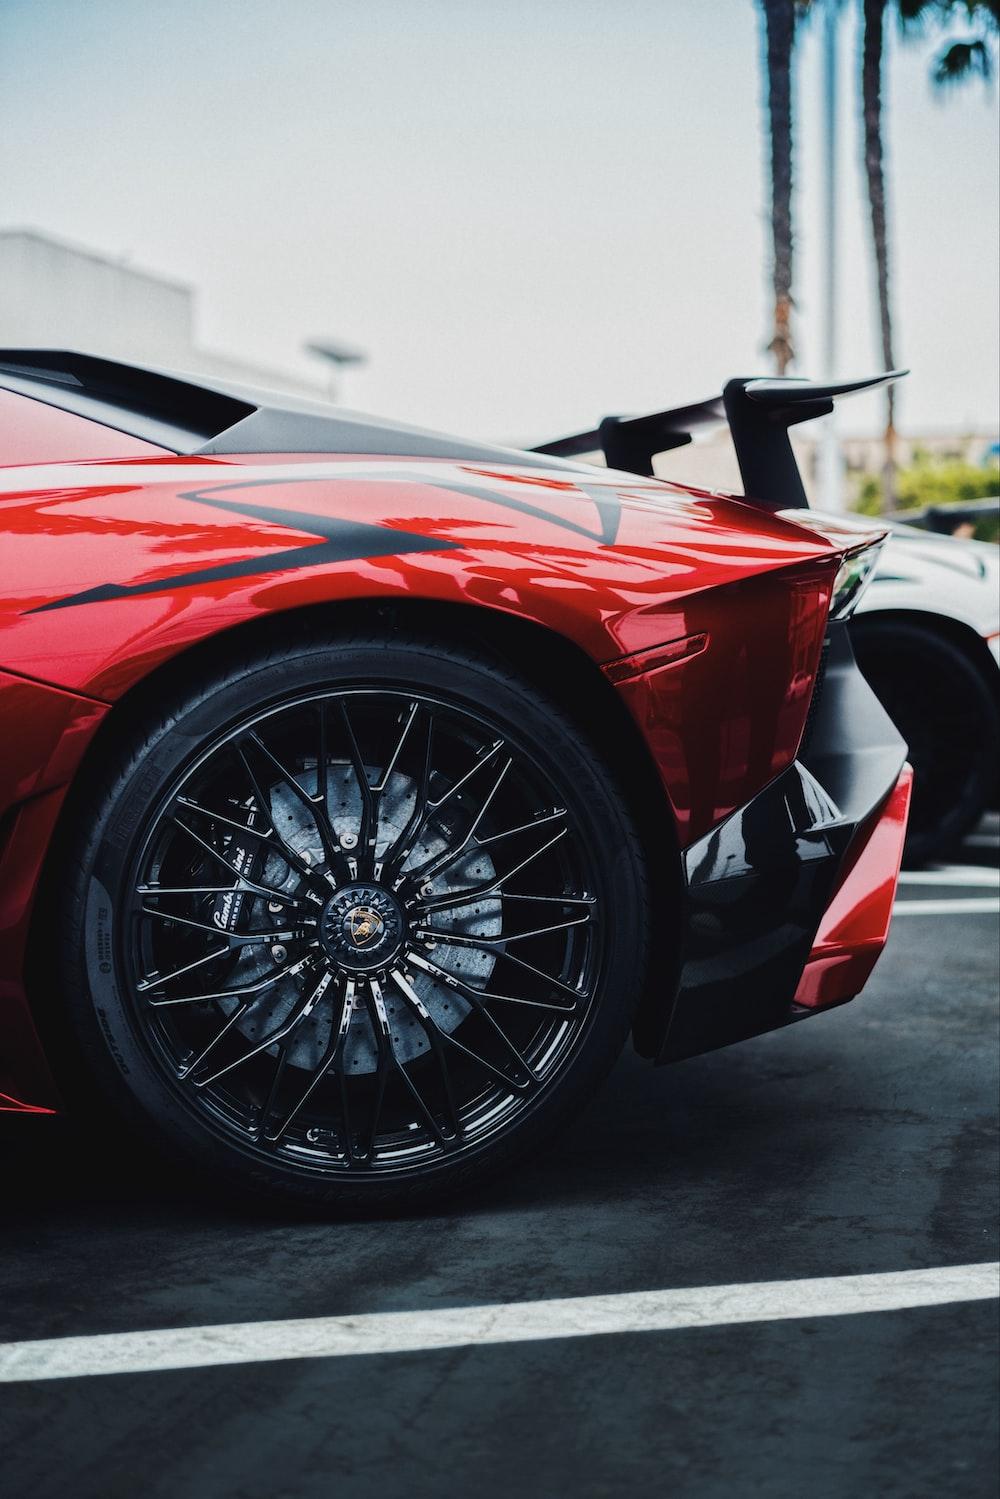 black and red Lamborghini Aventador SV rear left side